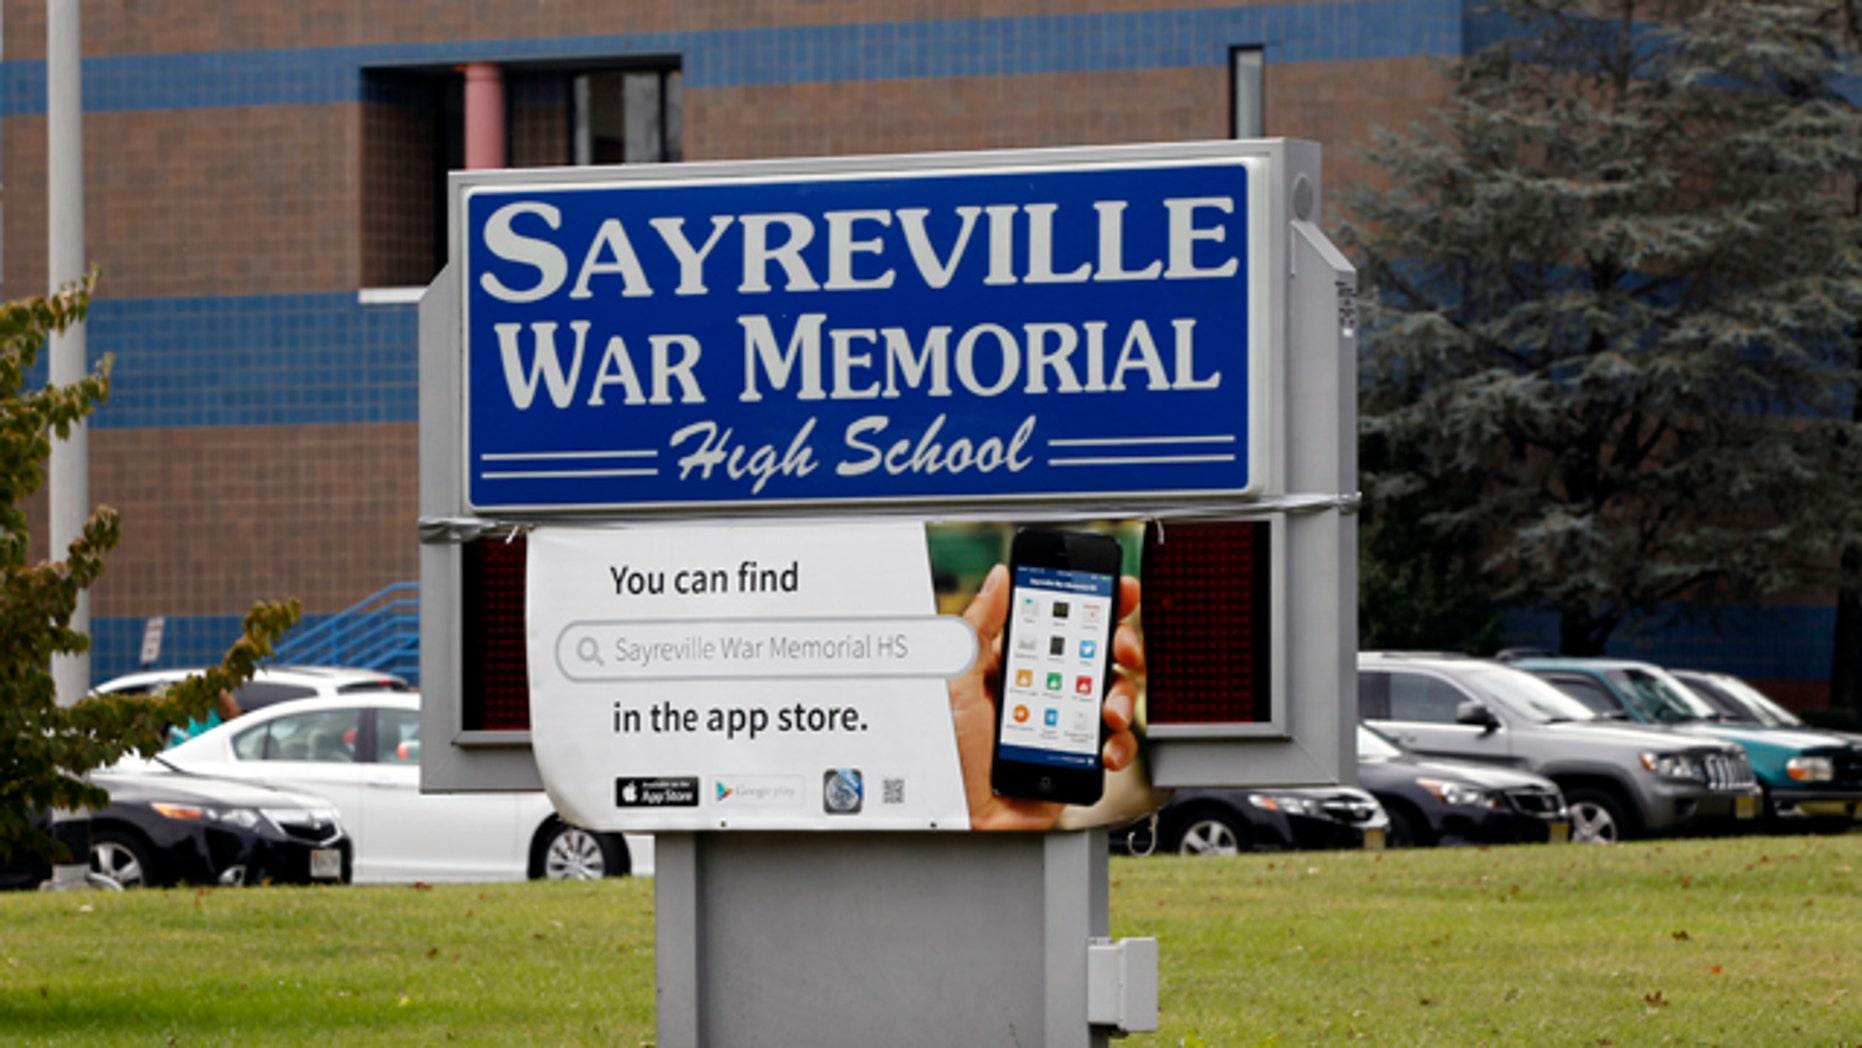 October 7, 2014: The entrance to Sayreville War Memorial High School is shown. (AP Photo/Mel Evans)